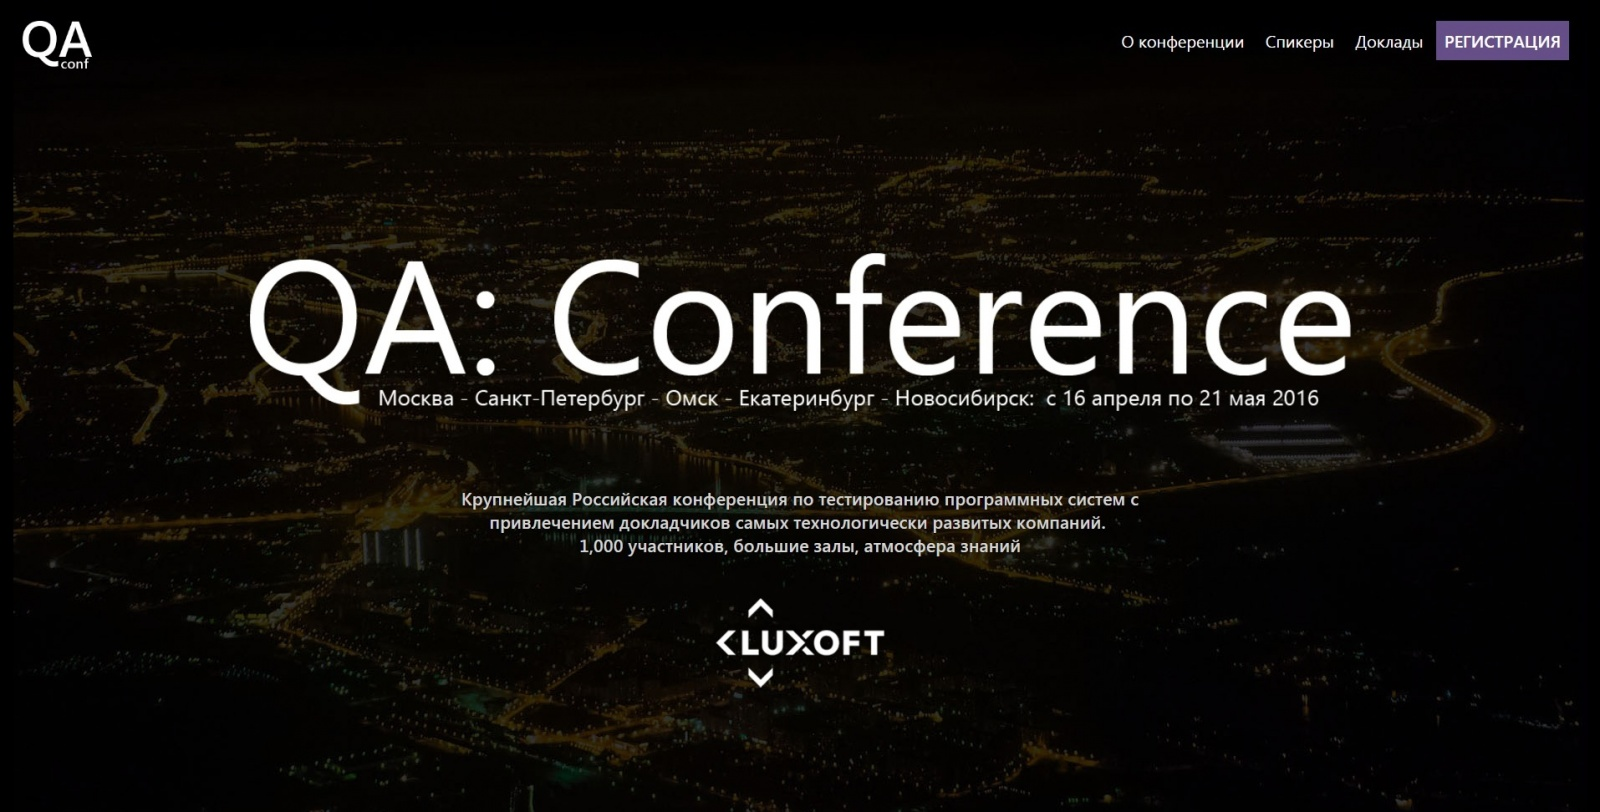 QA: Conference. Сибирь - 1